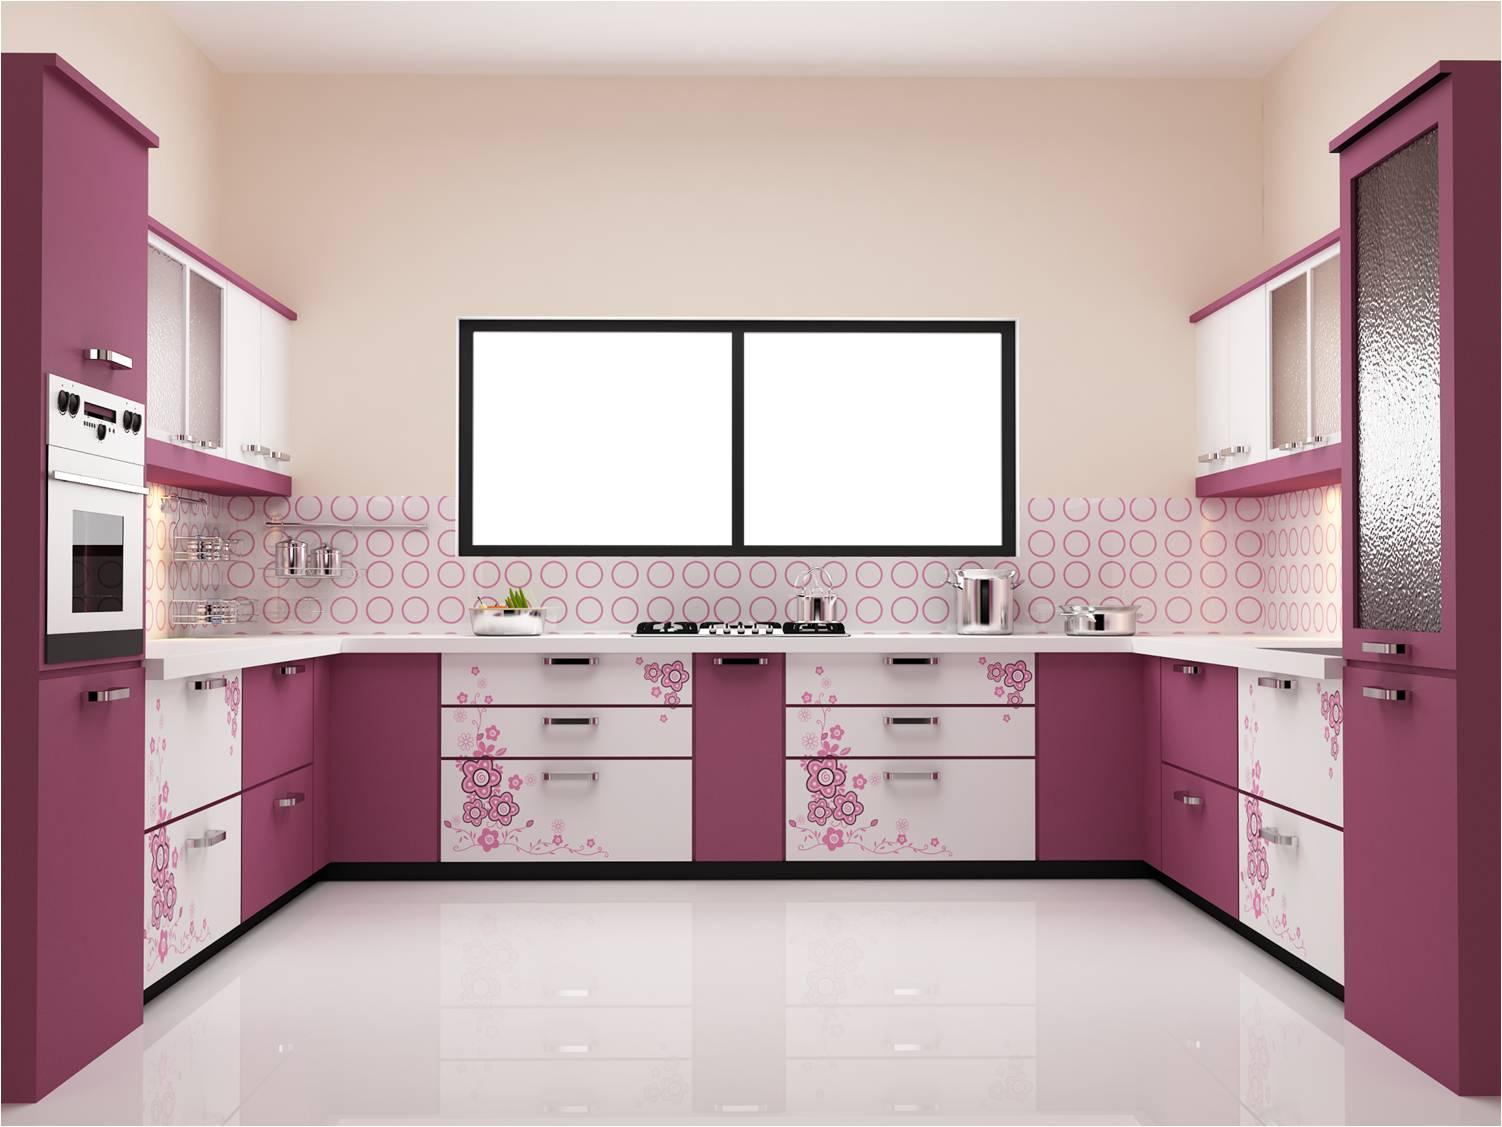 Modular Kitchen Designs  Designer Kitchens 💖💯 for Android   APK ...